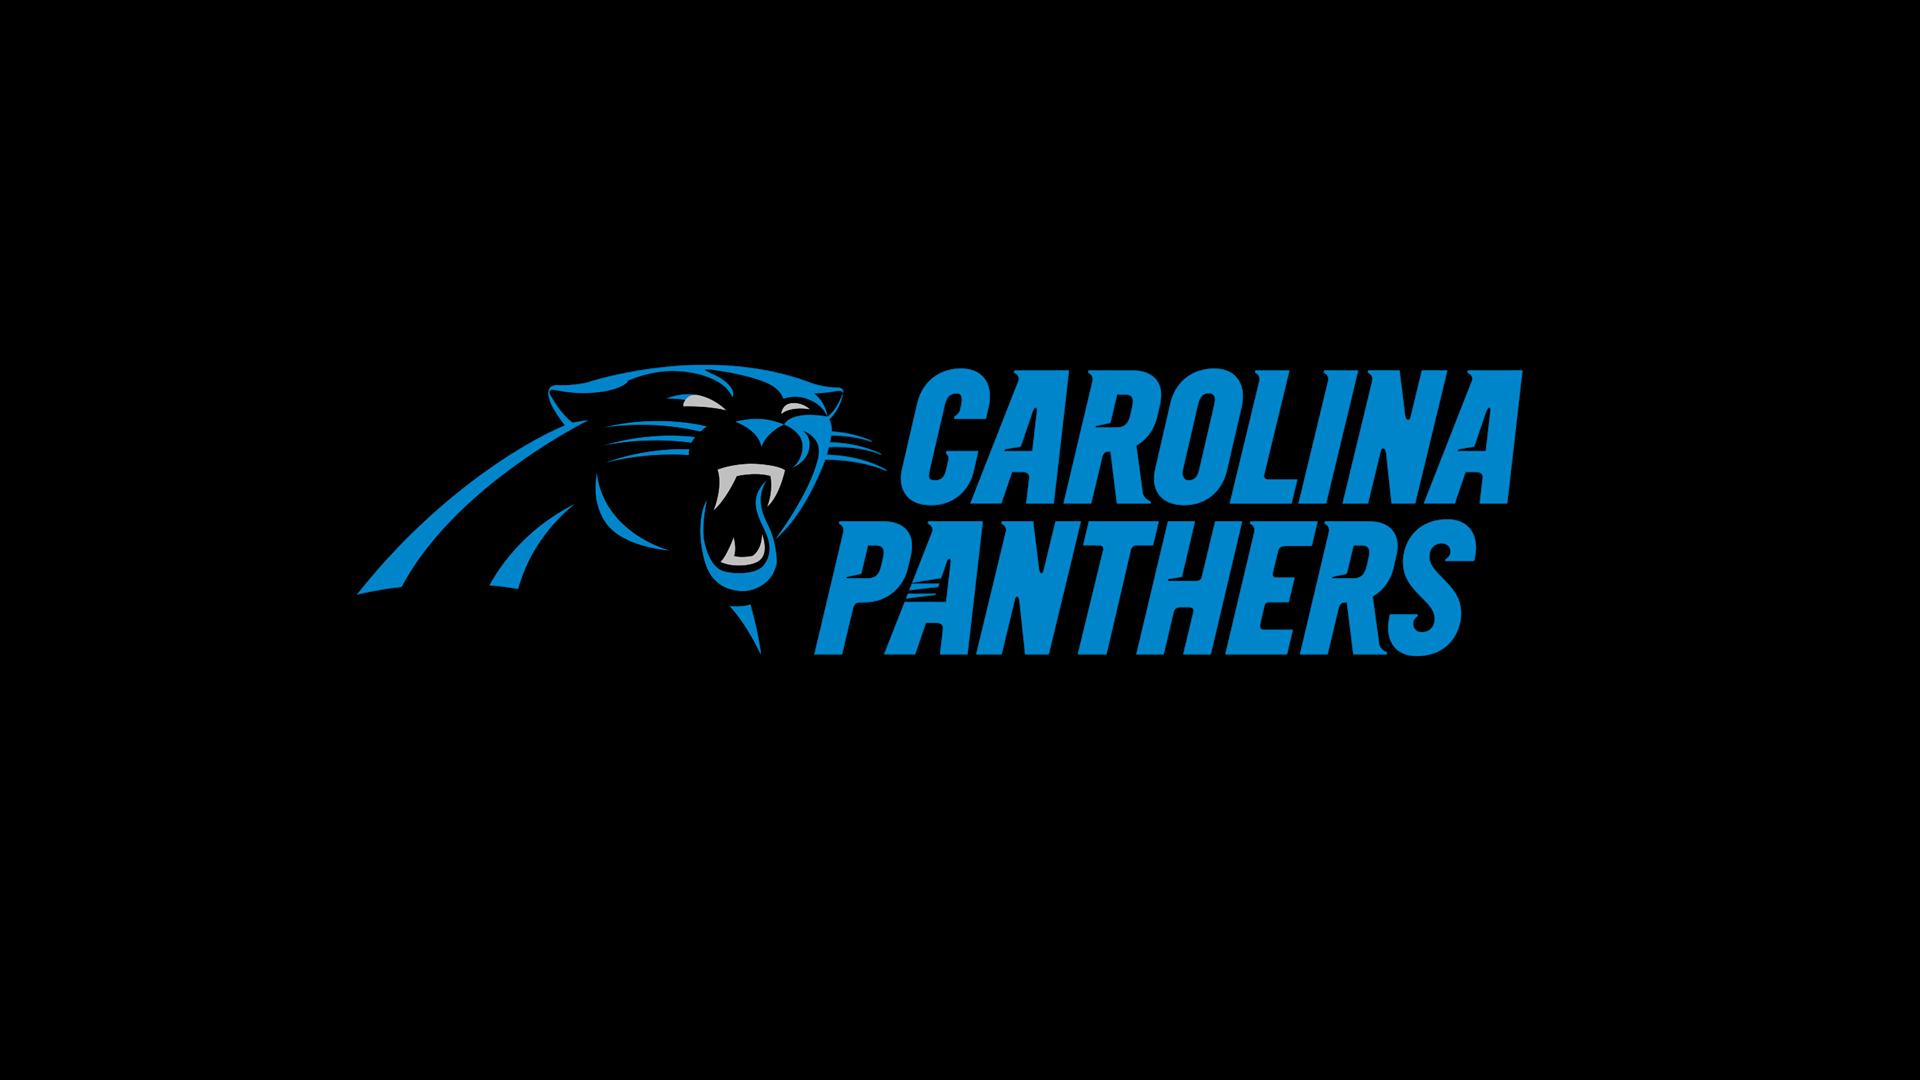 Carolina Panthers Preview For 2020 Nfl Season 13newsnow Com